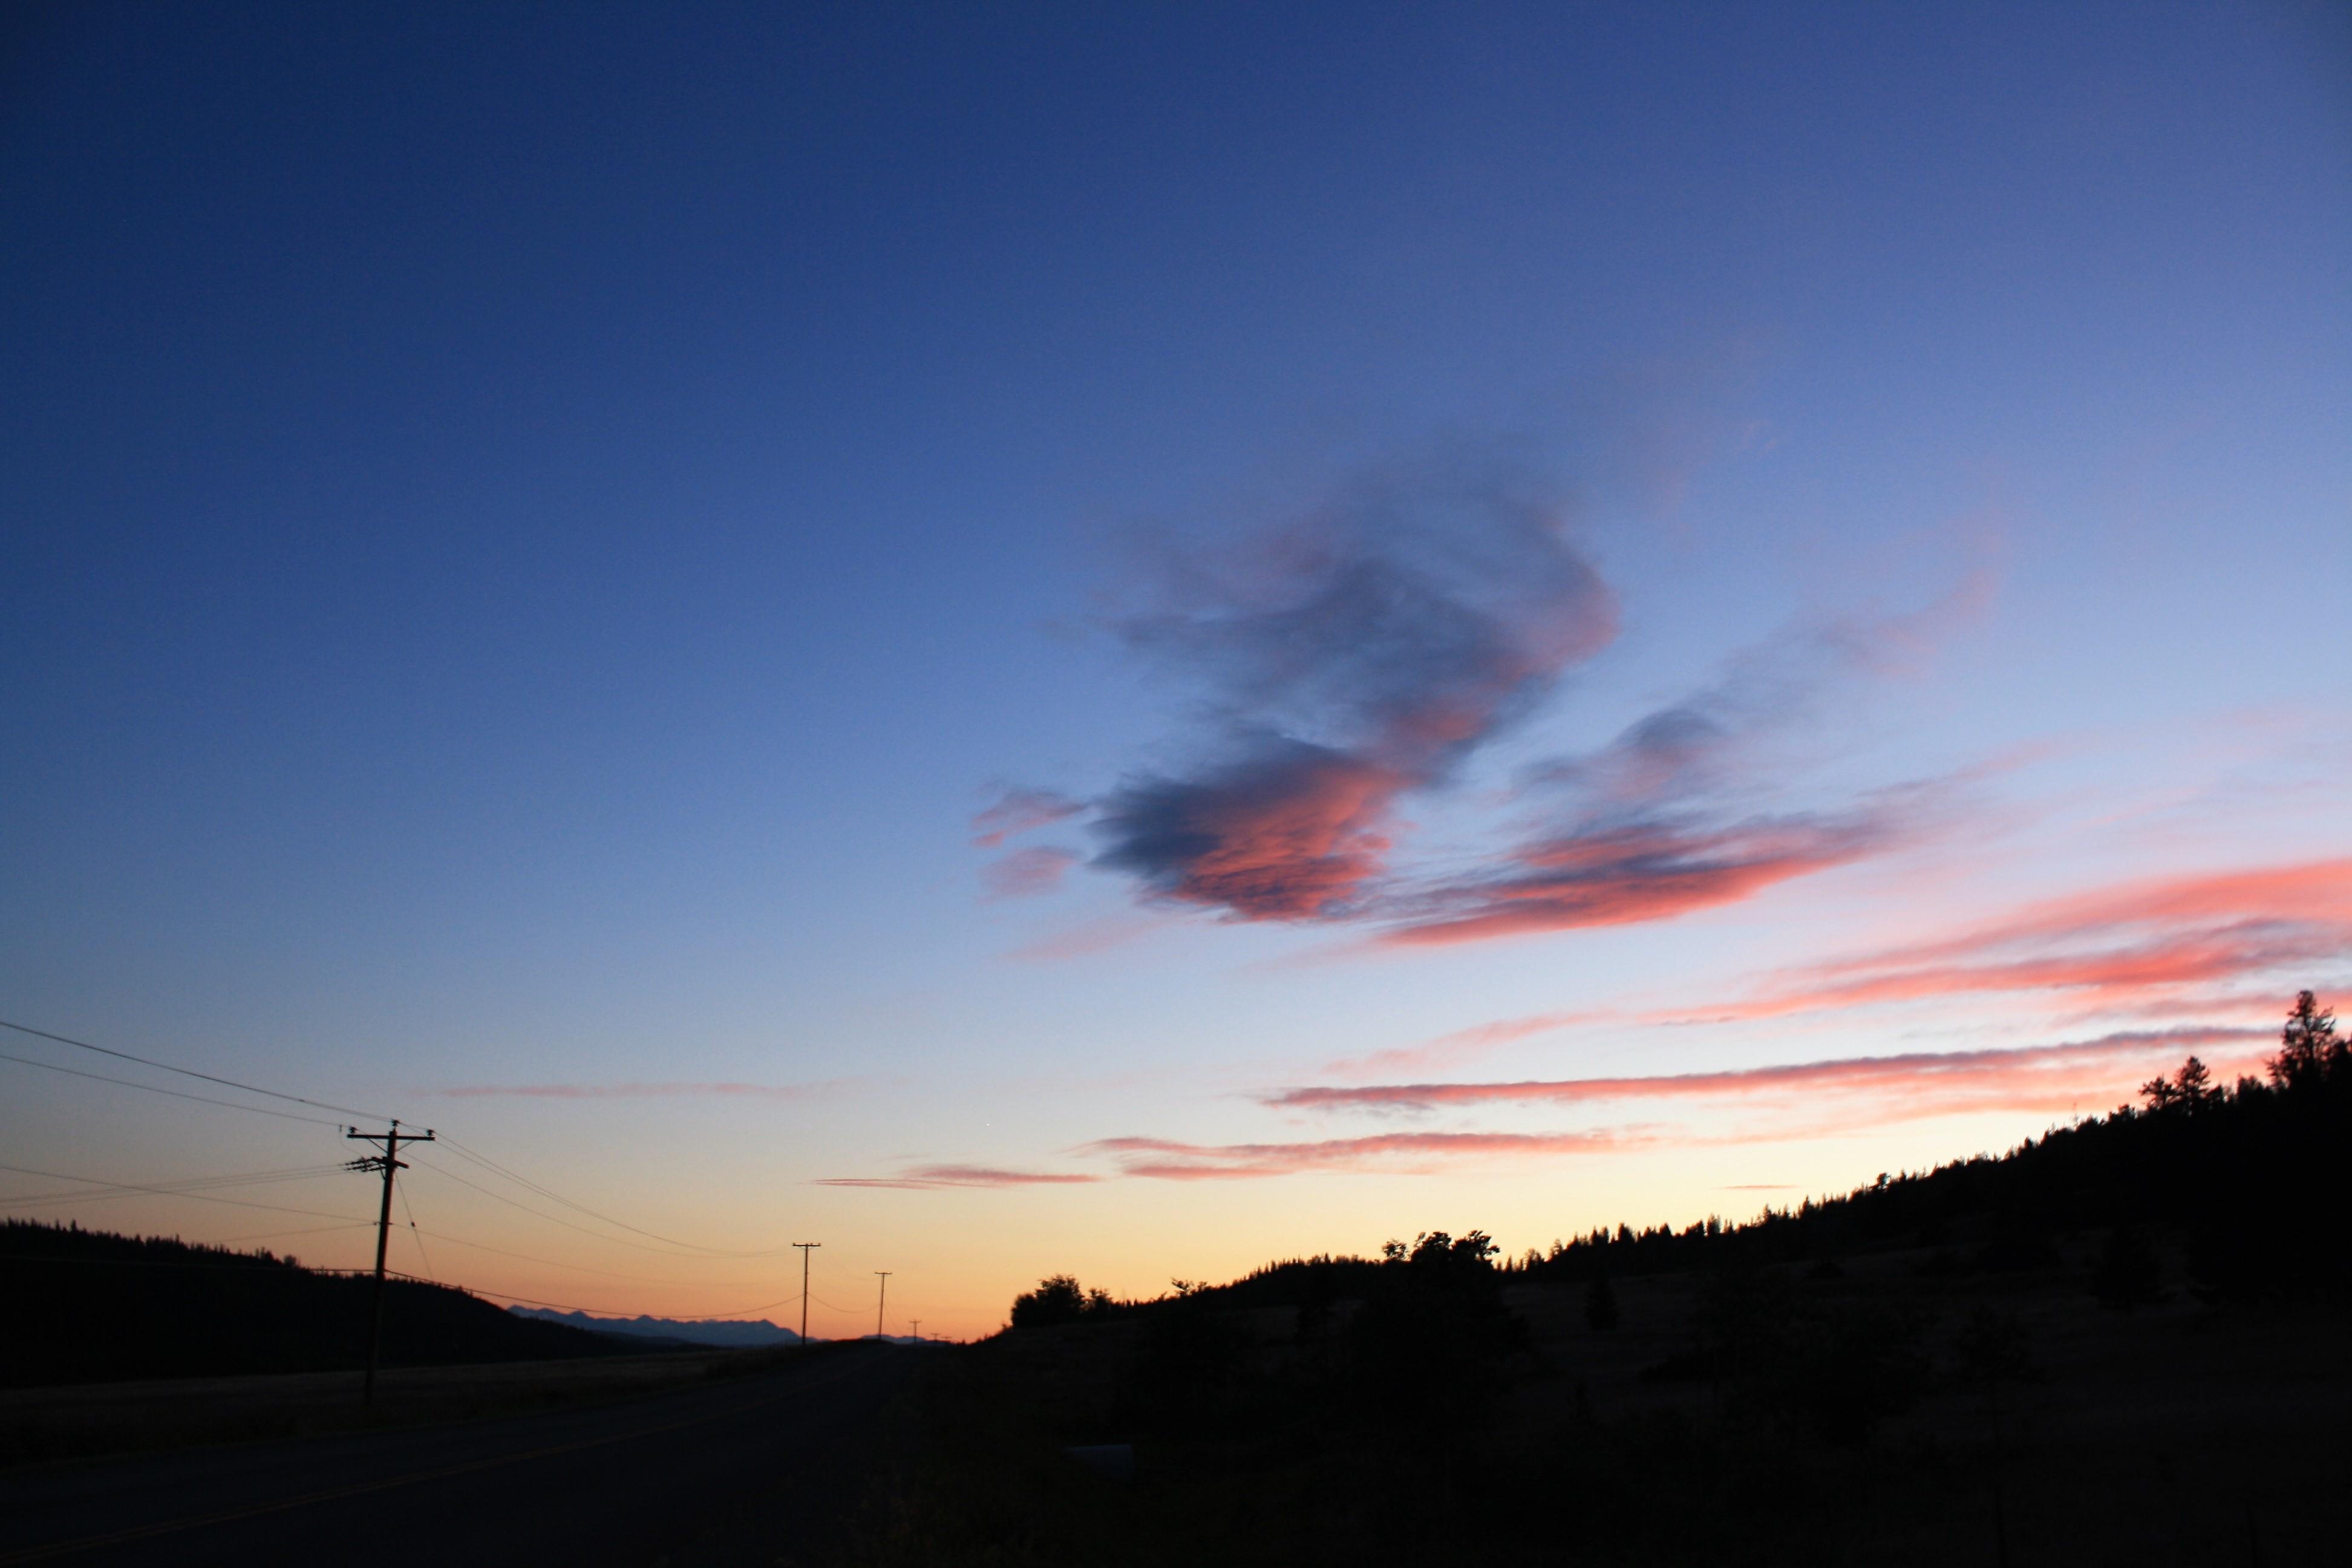 DM_nature_sunsetssunrises_0160